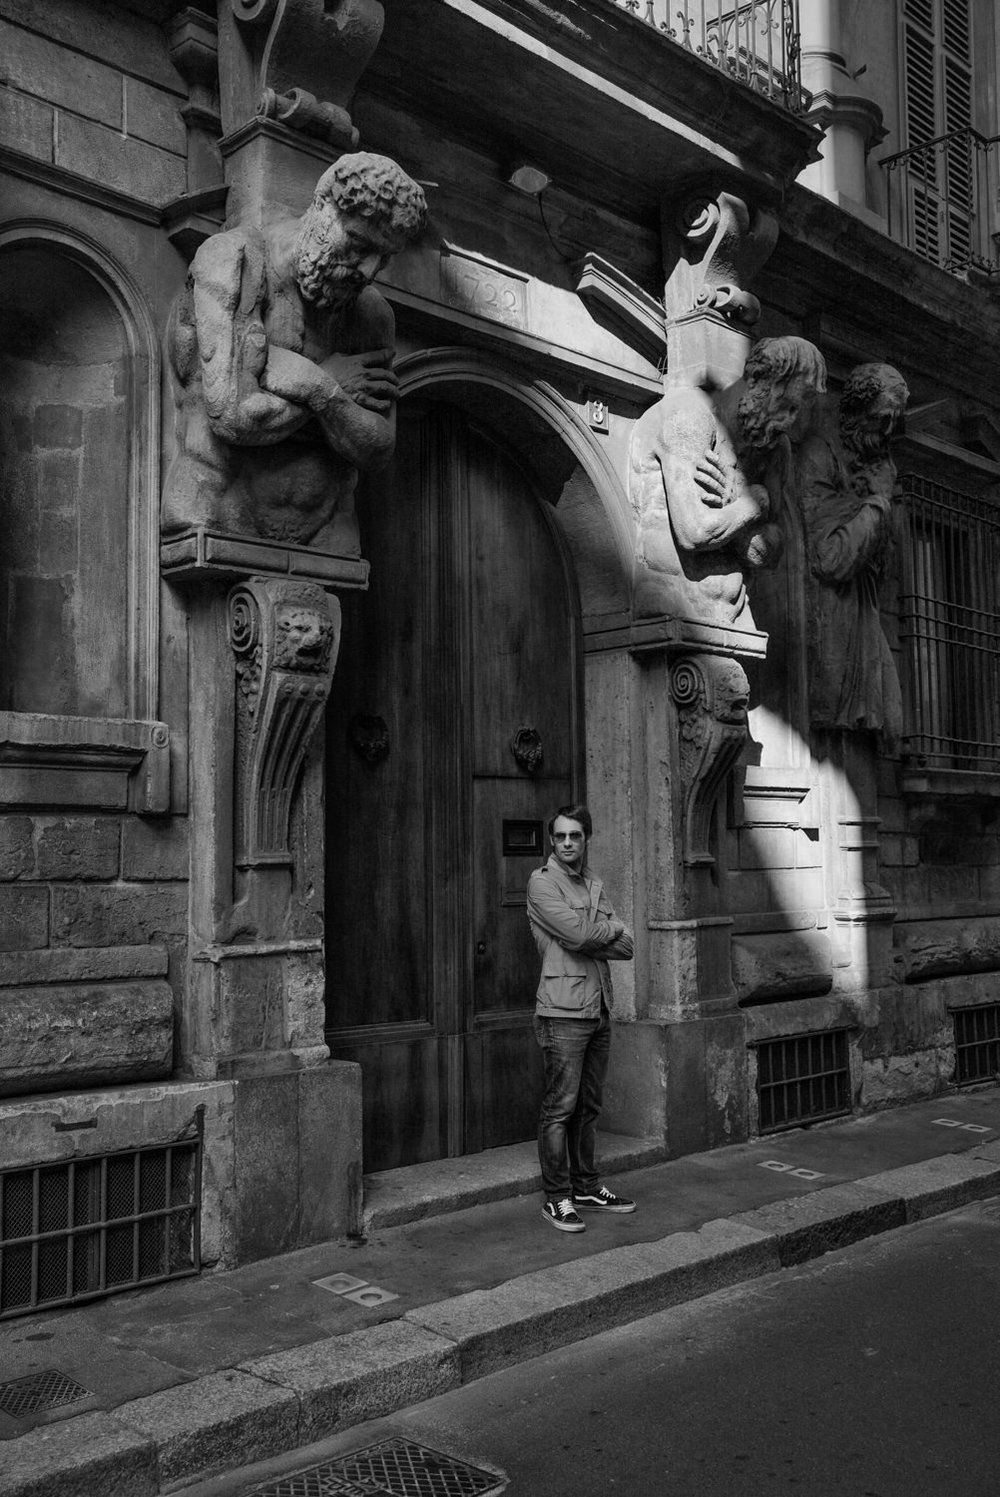 2014-Milano-Eolo-Perfido-Street-Photography-020.jpg